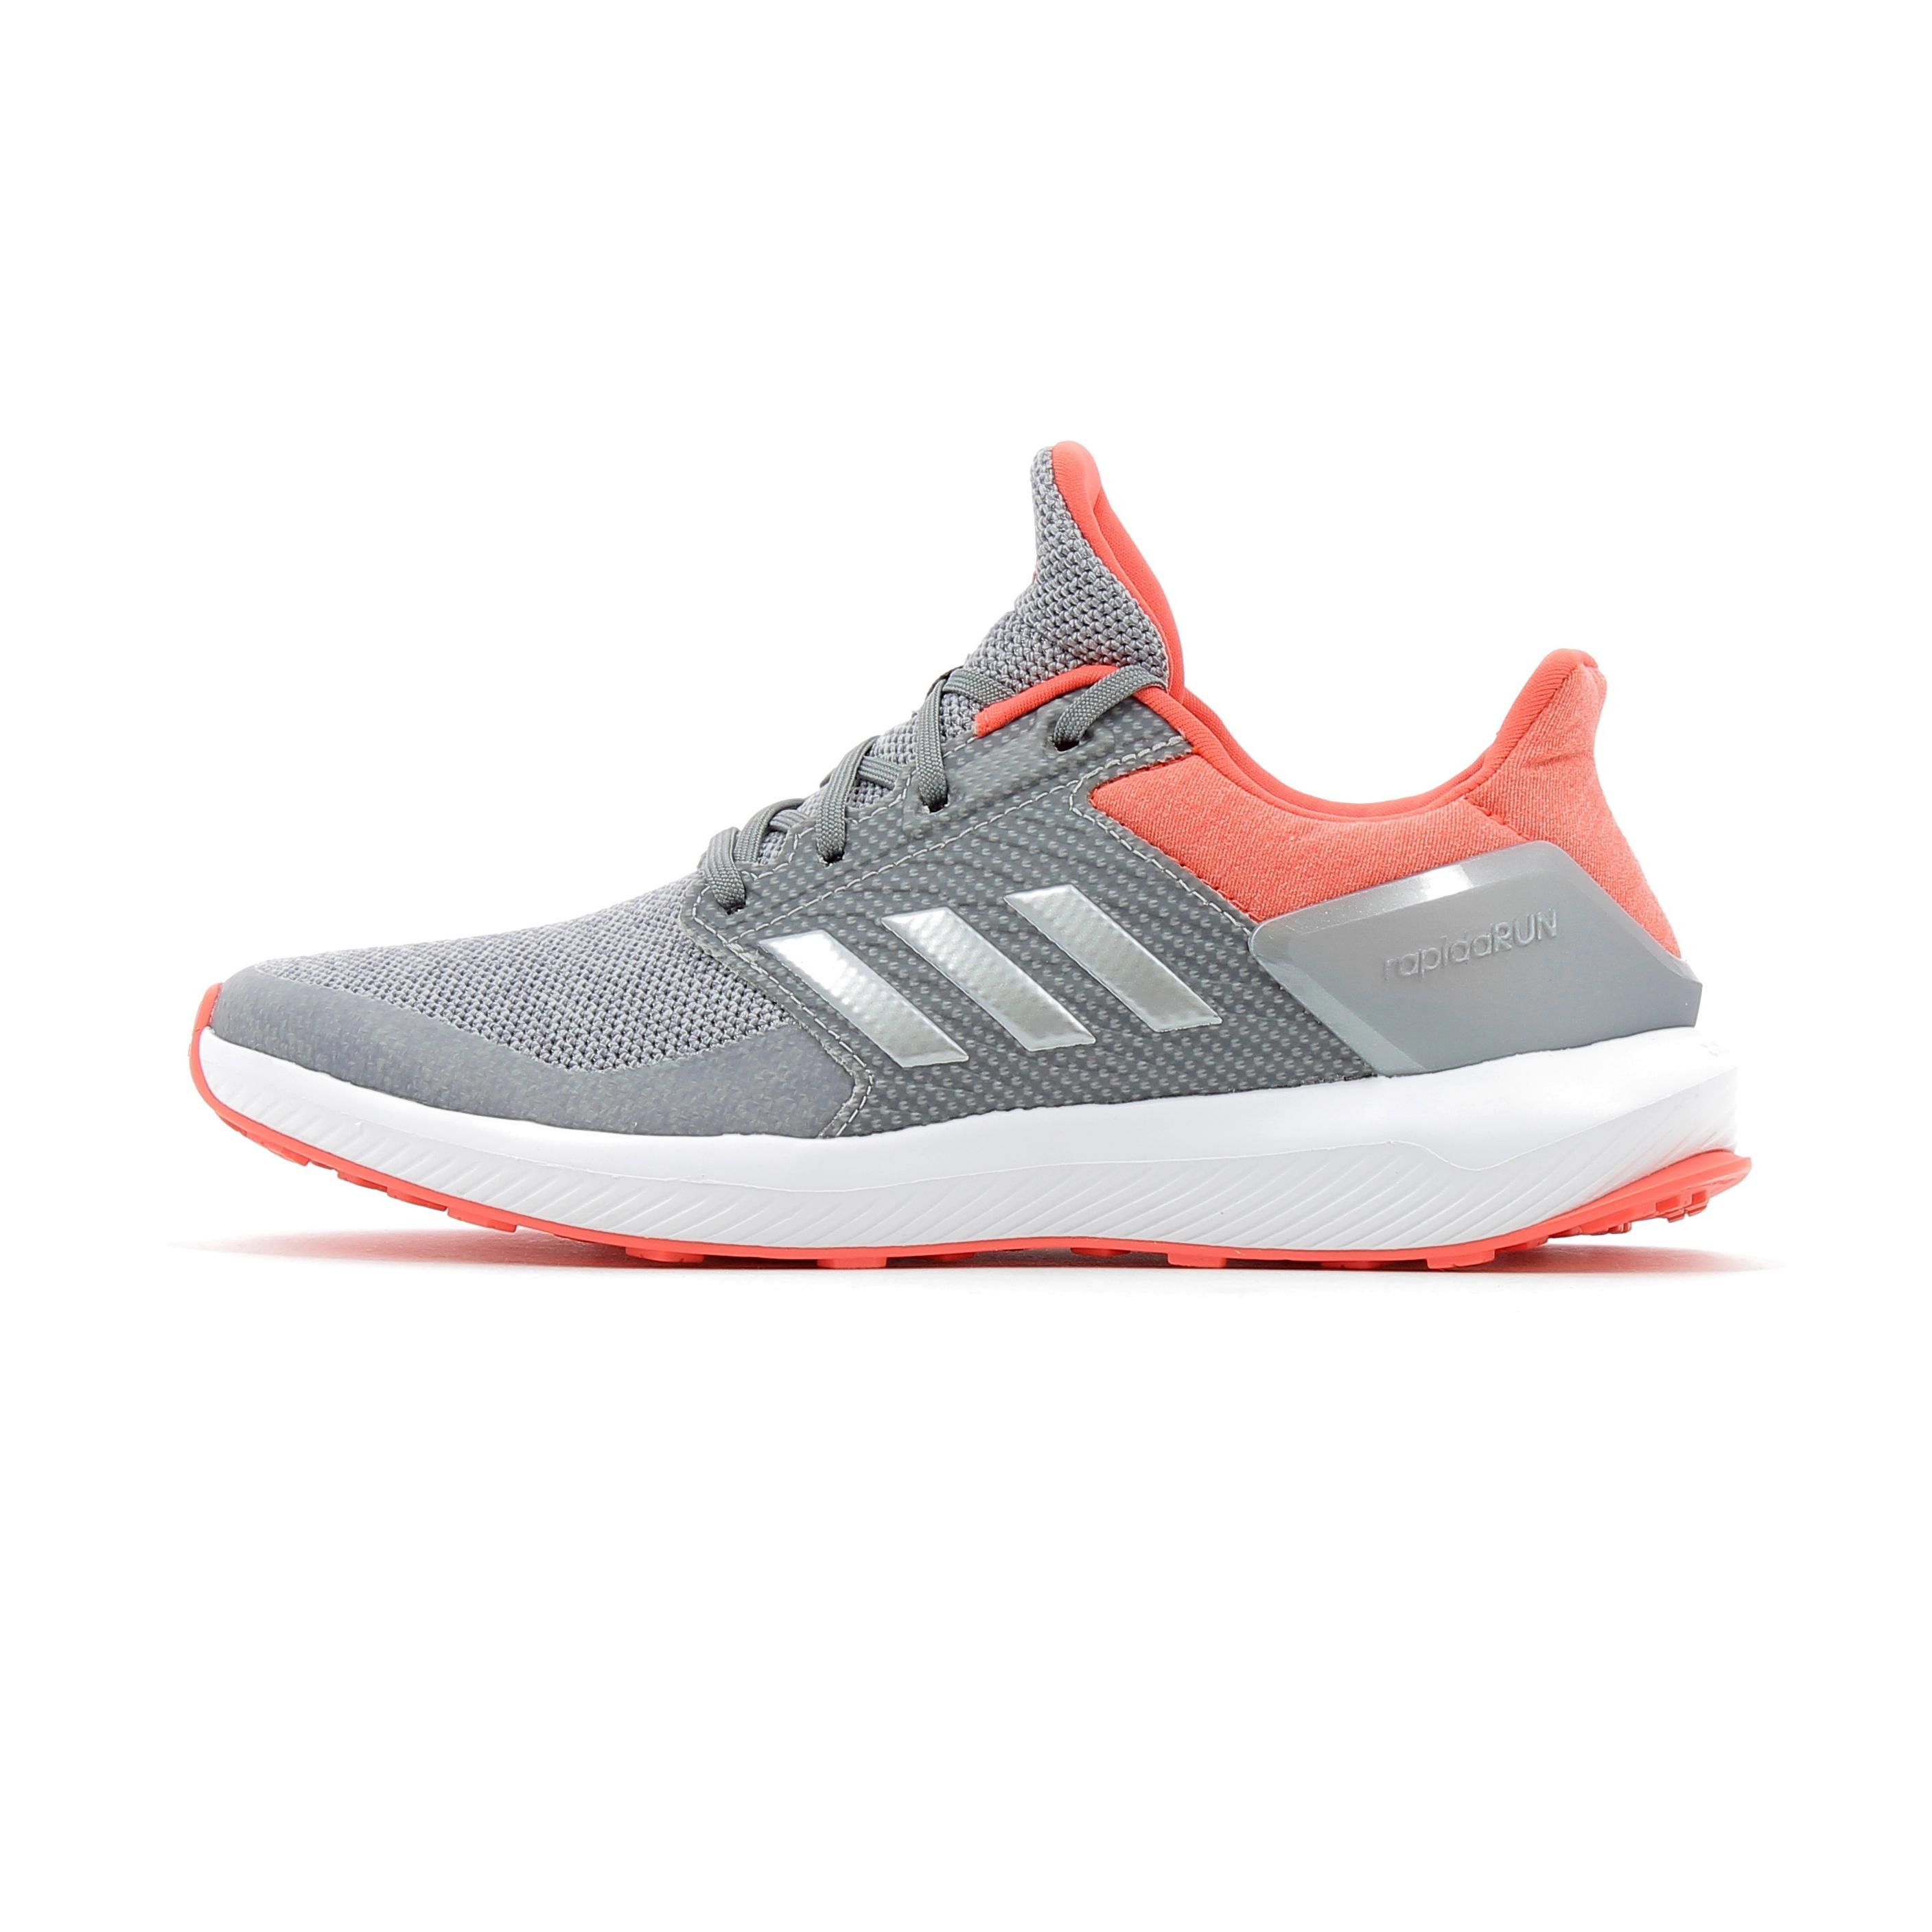 Chaussures de running enfant Adidas Performance RapidaRun Kids Gris